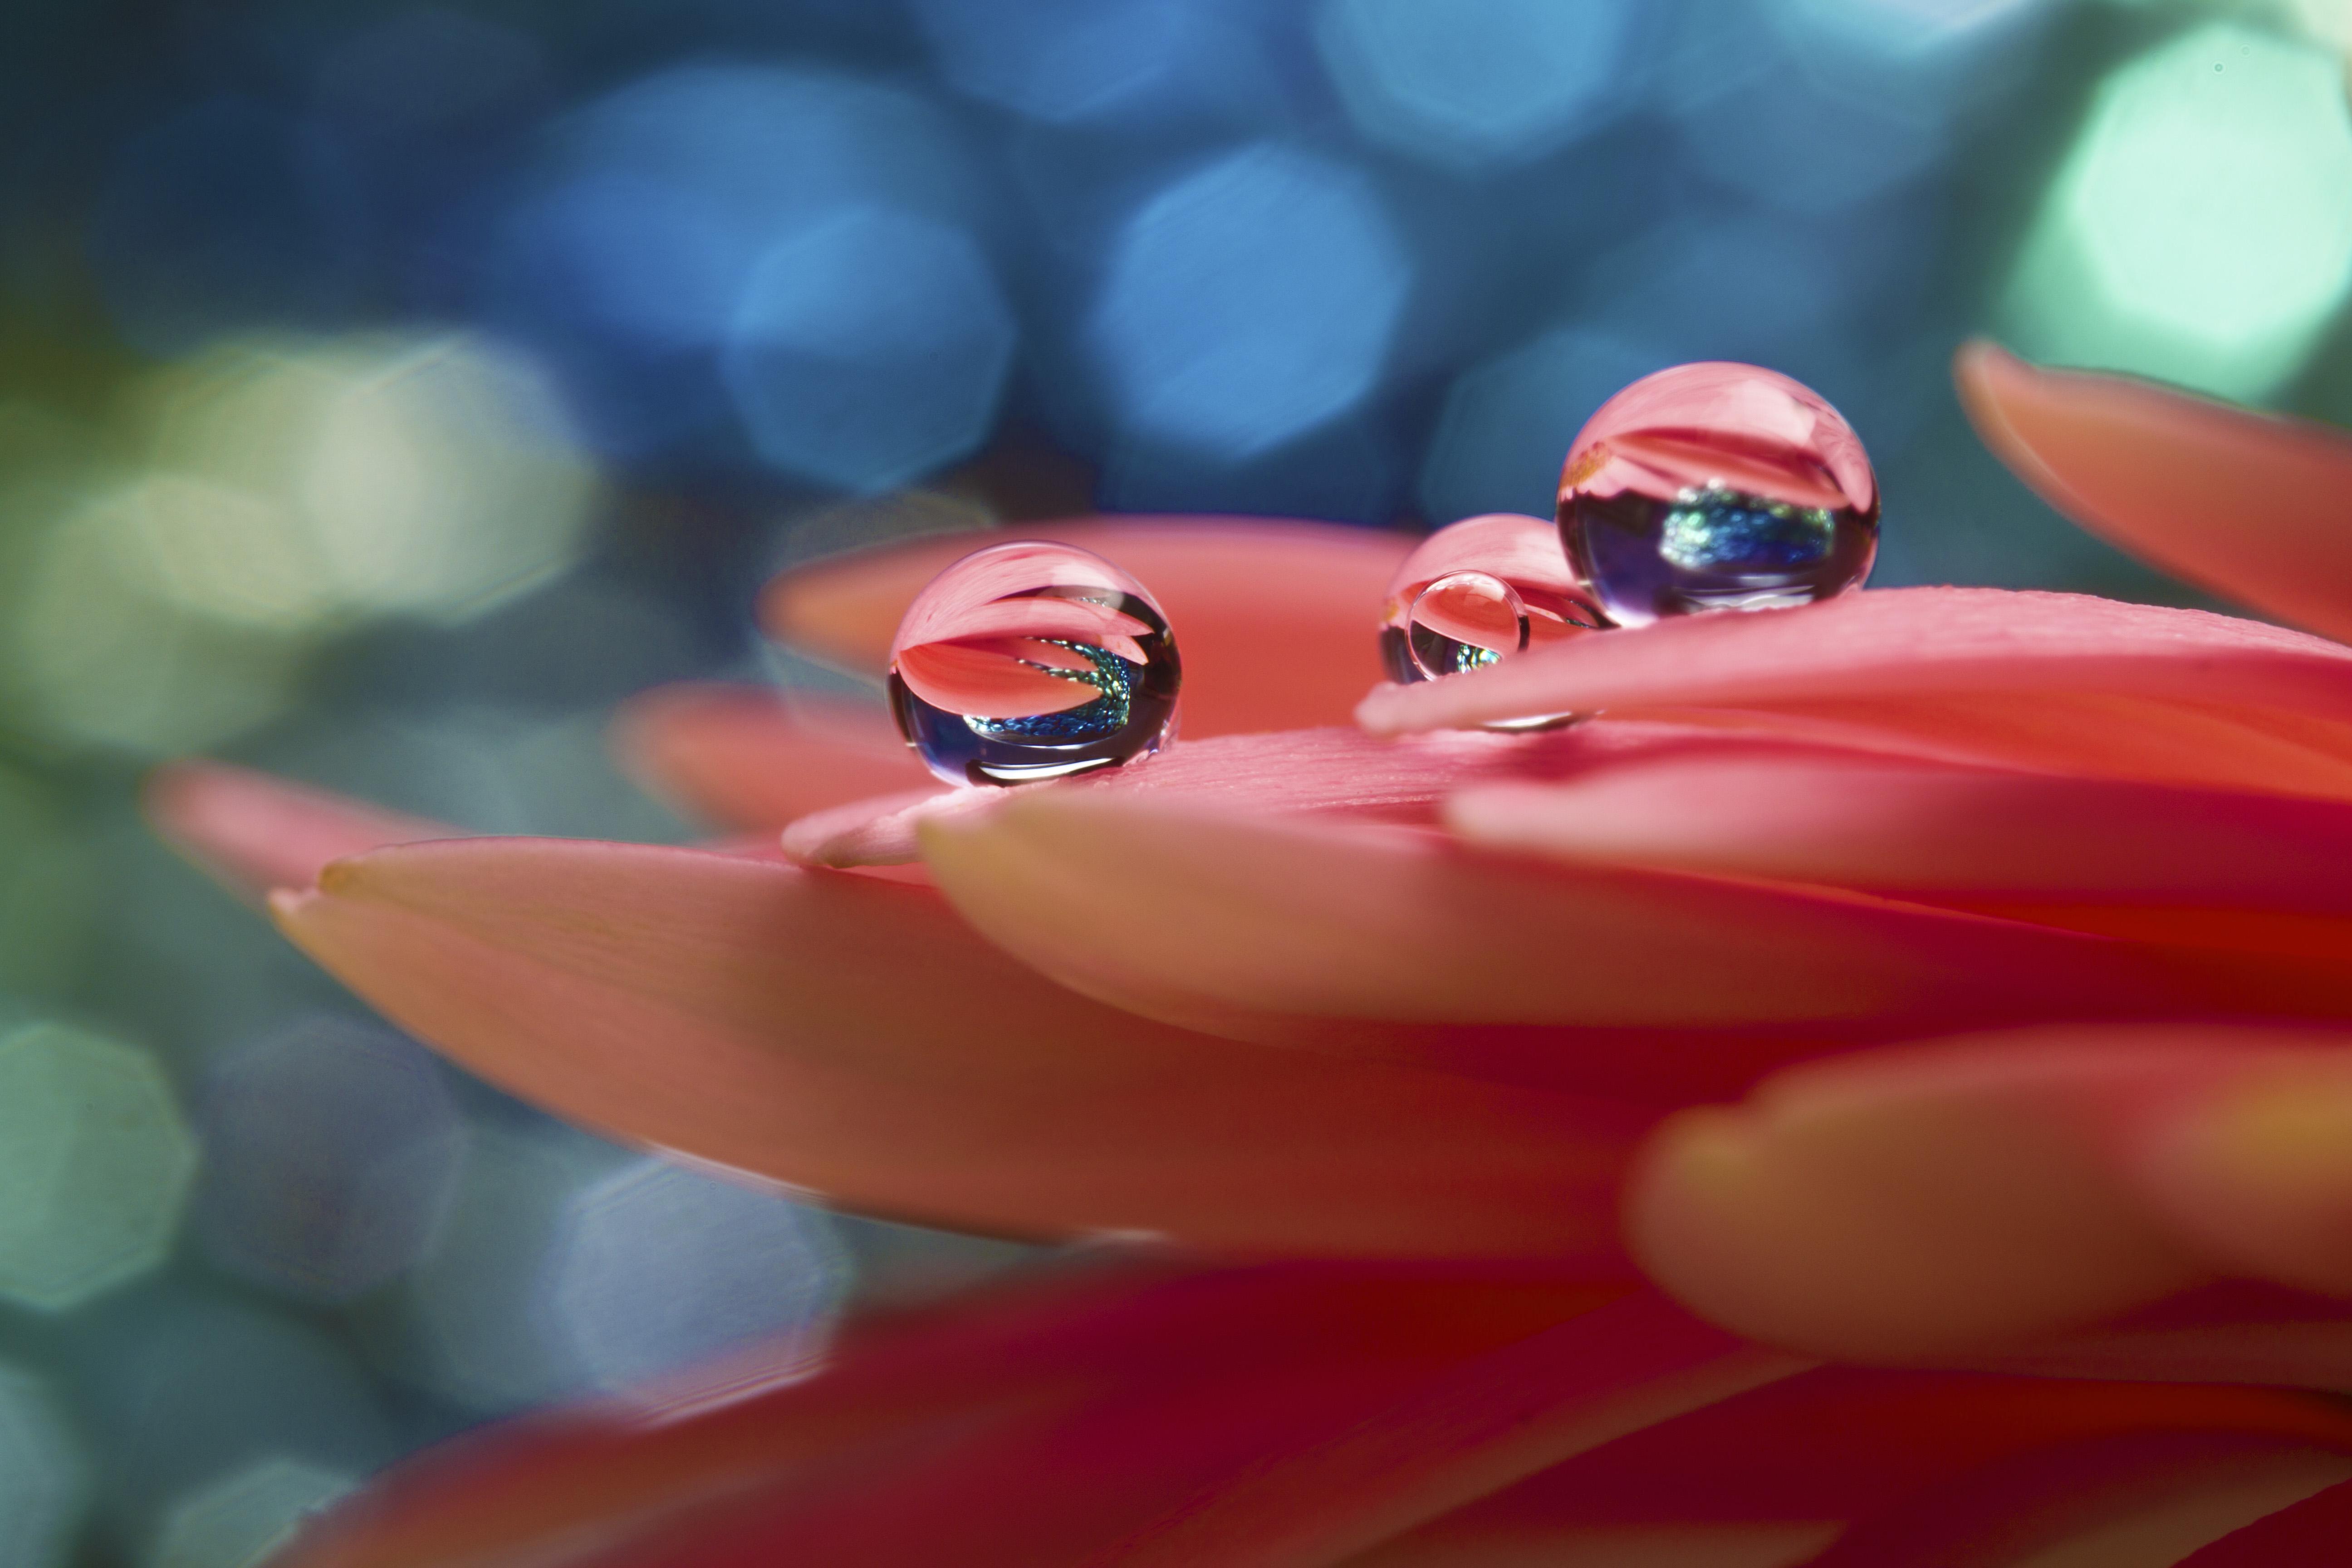 Wallpaper : water, nature, red, reflection, green, blue, bokeh ...